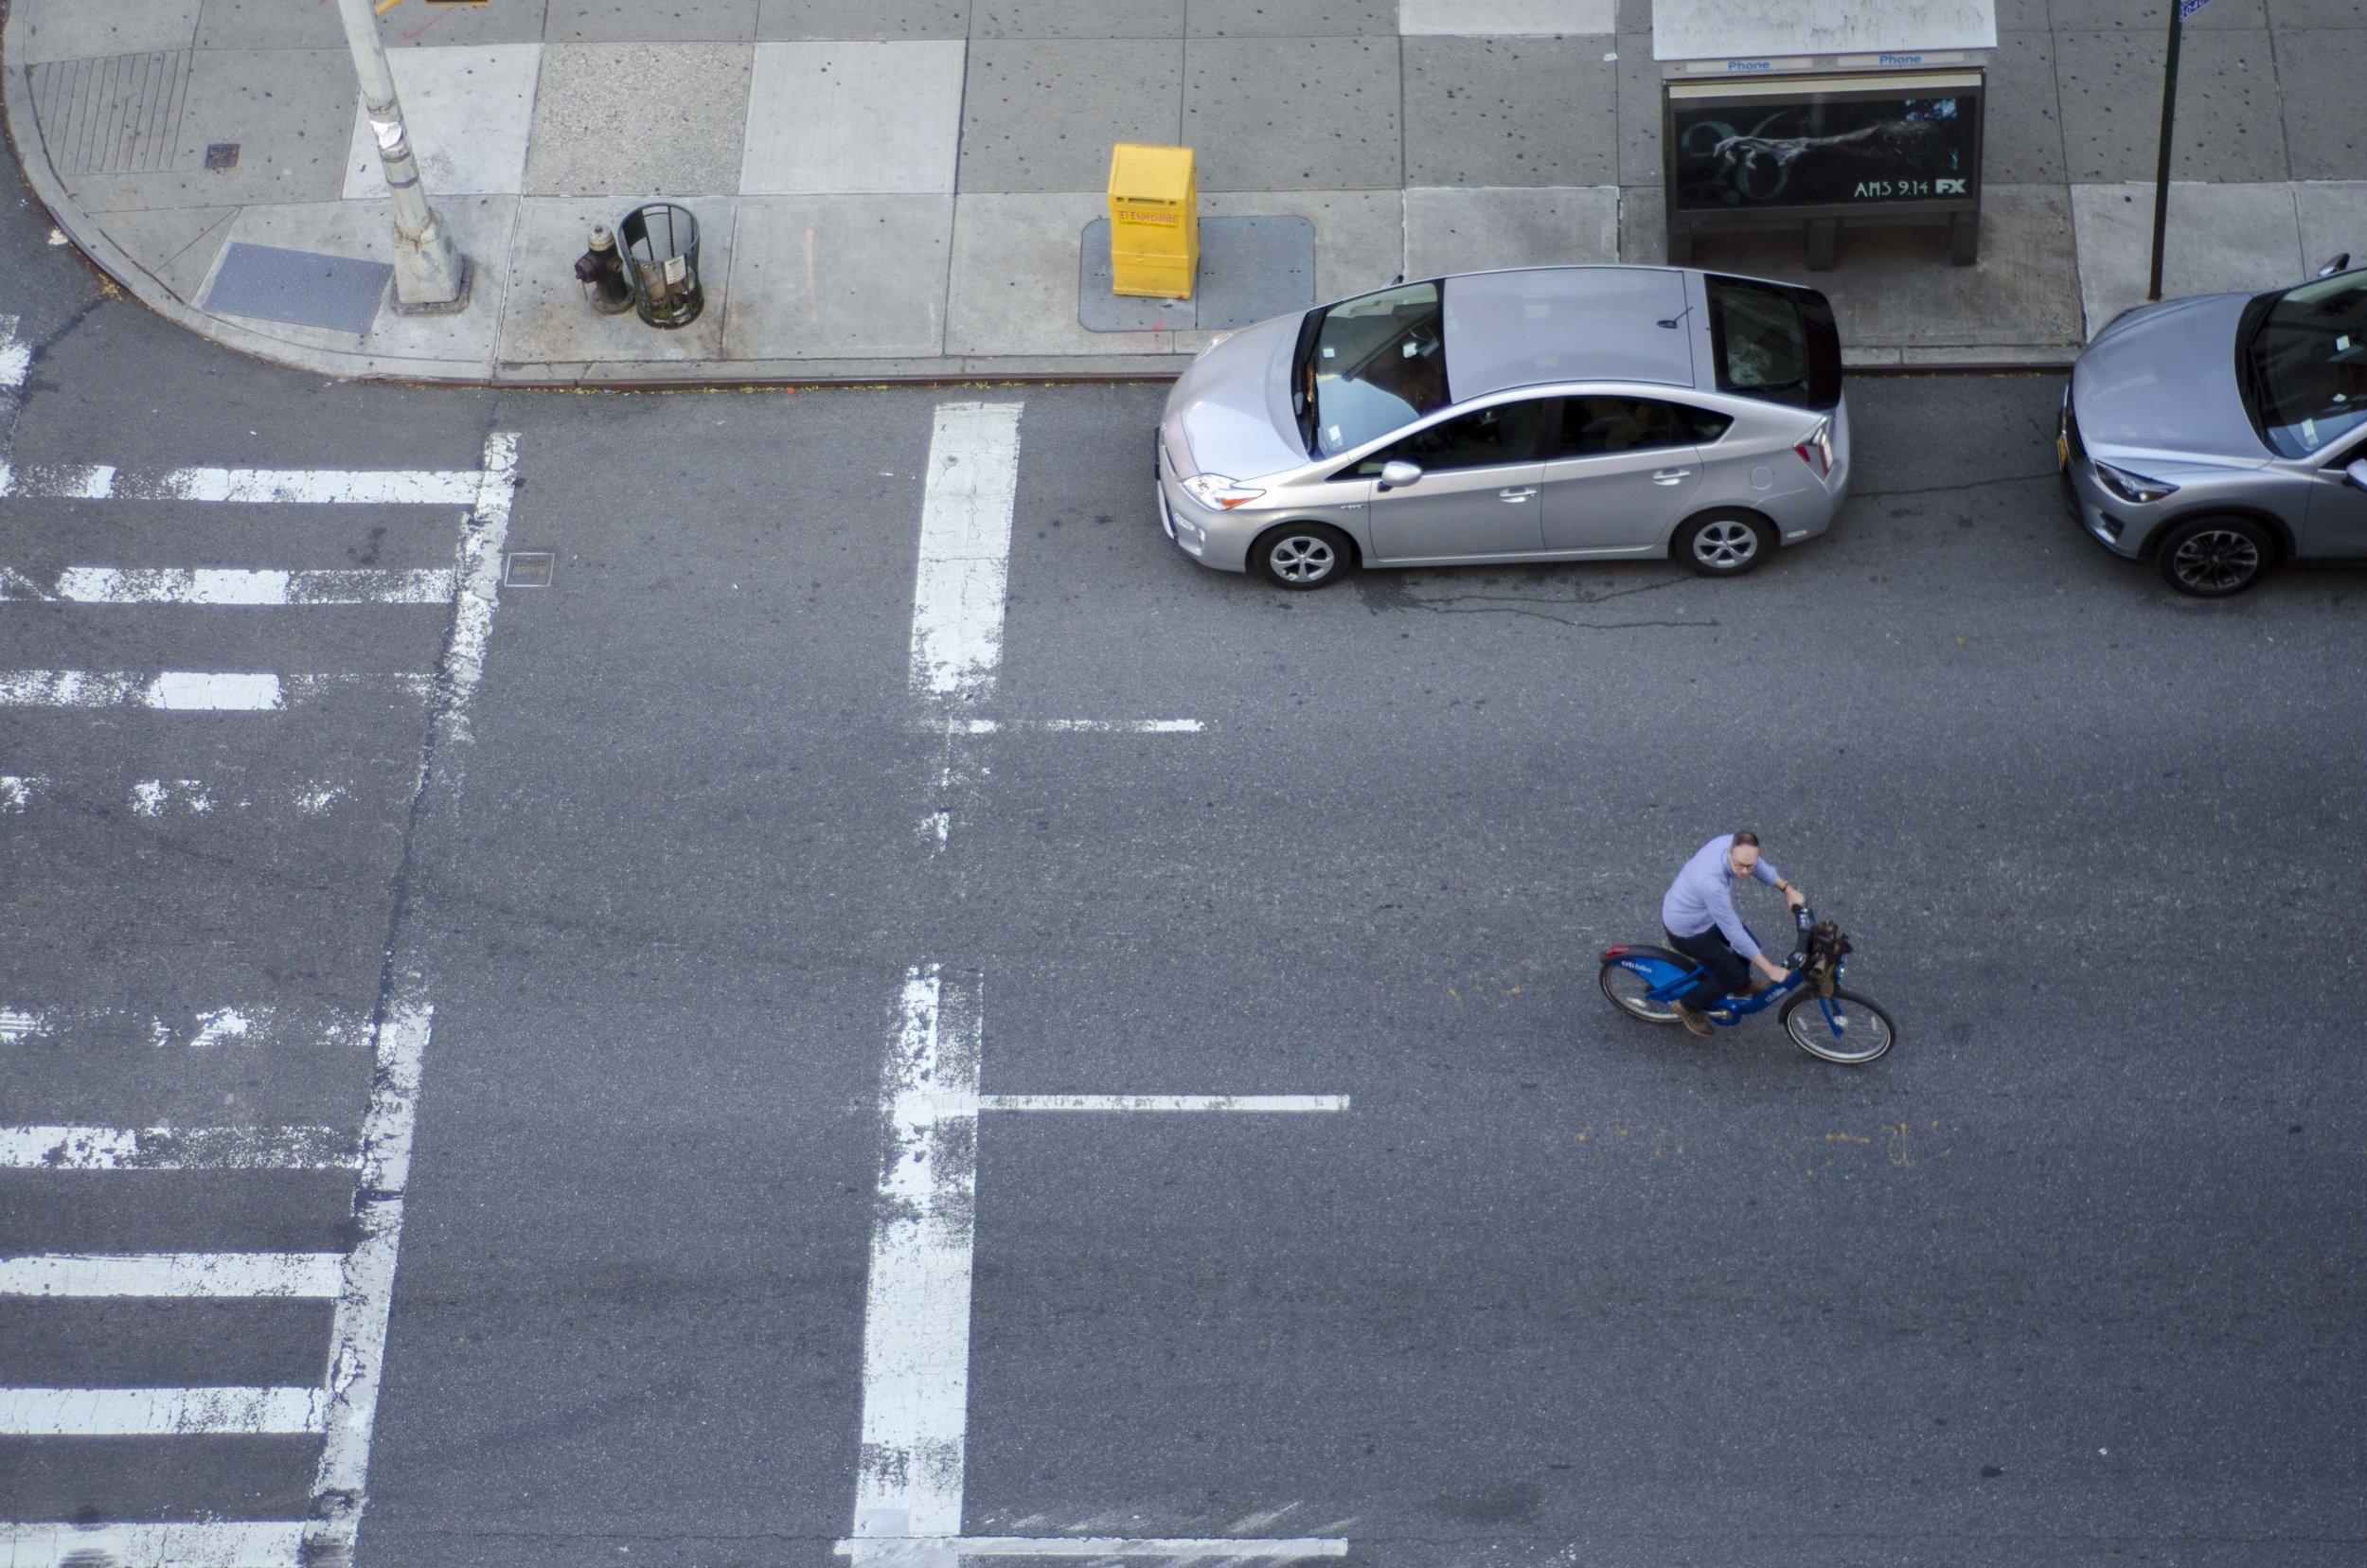 NYC_44.jpg